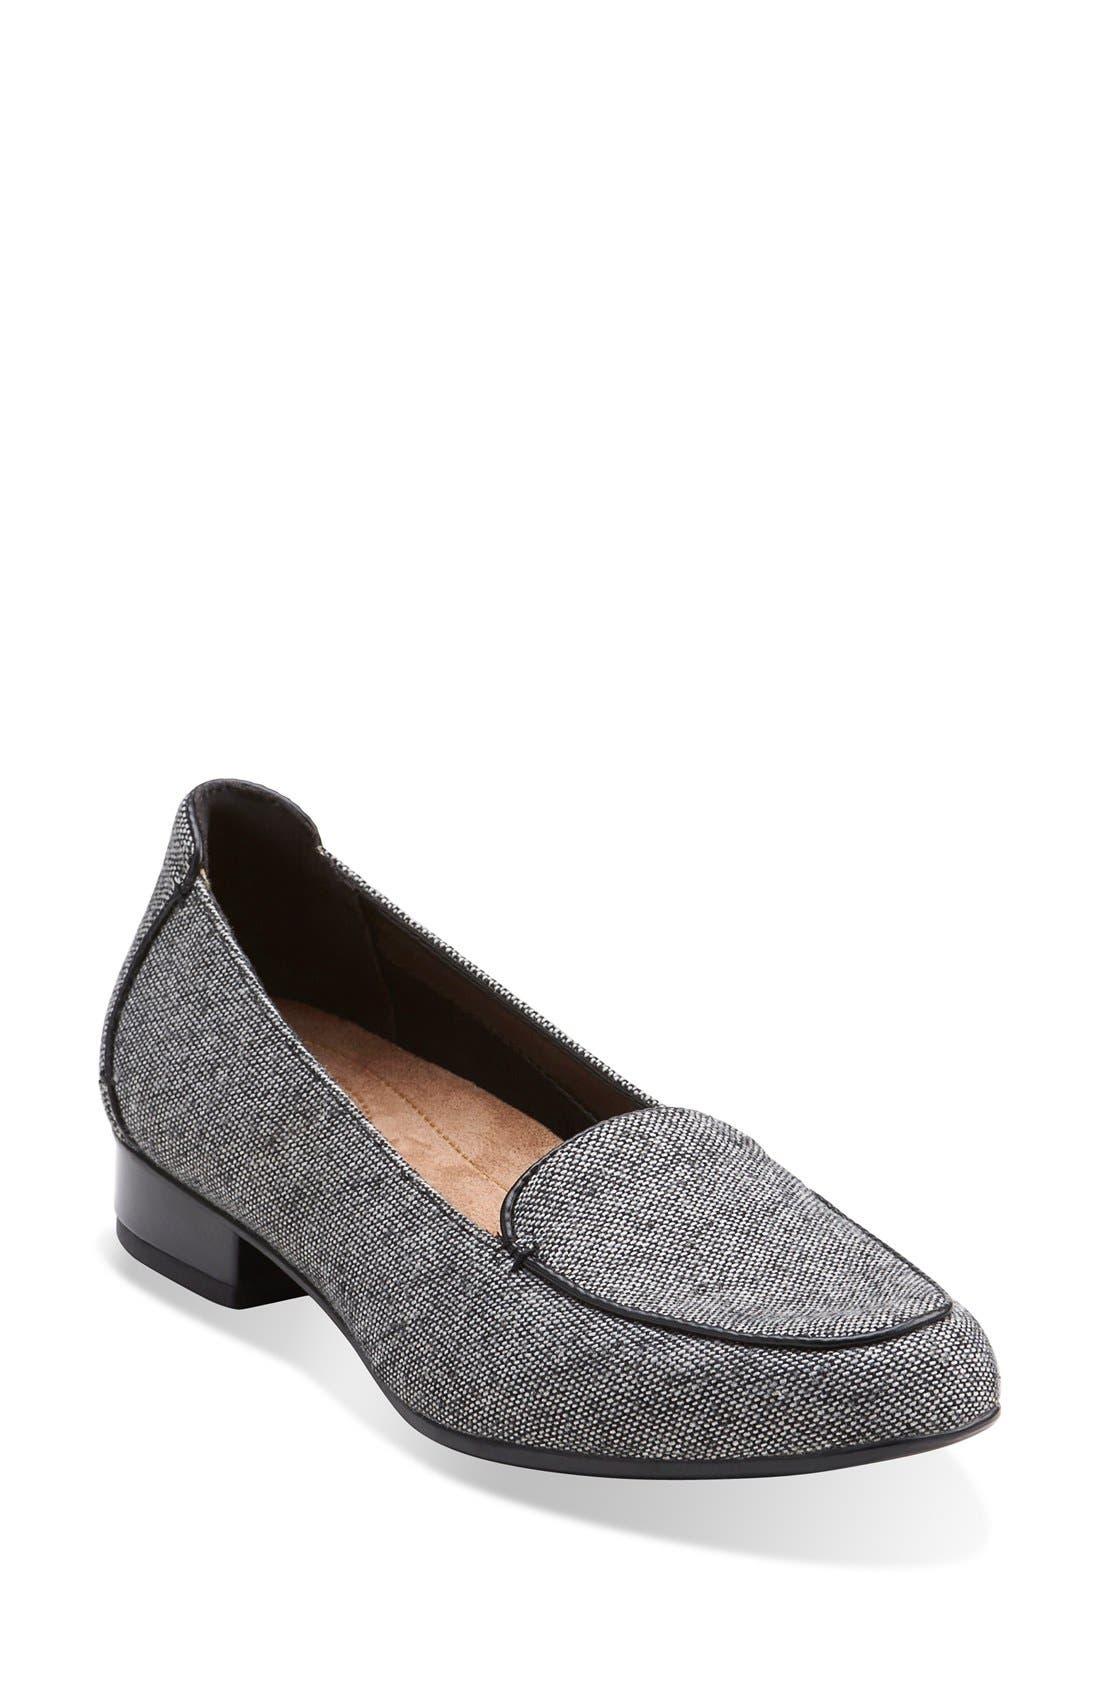 'KeeshaLuca' Loafer,                         Main,                         color, Grey Tweed